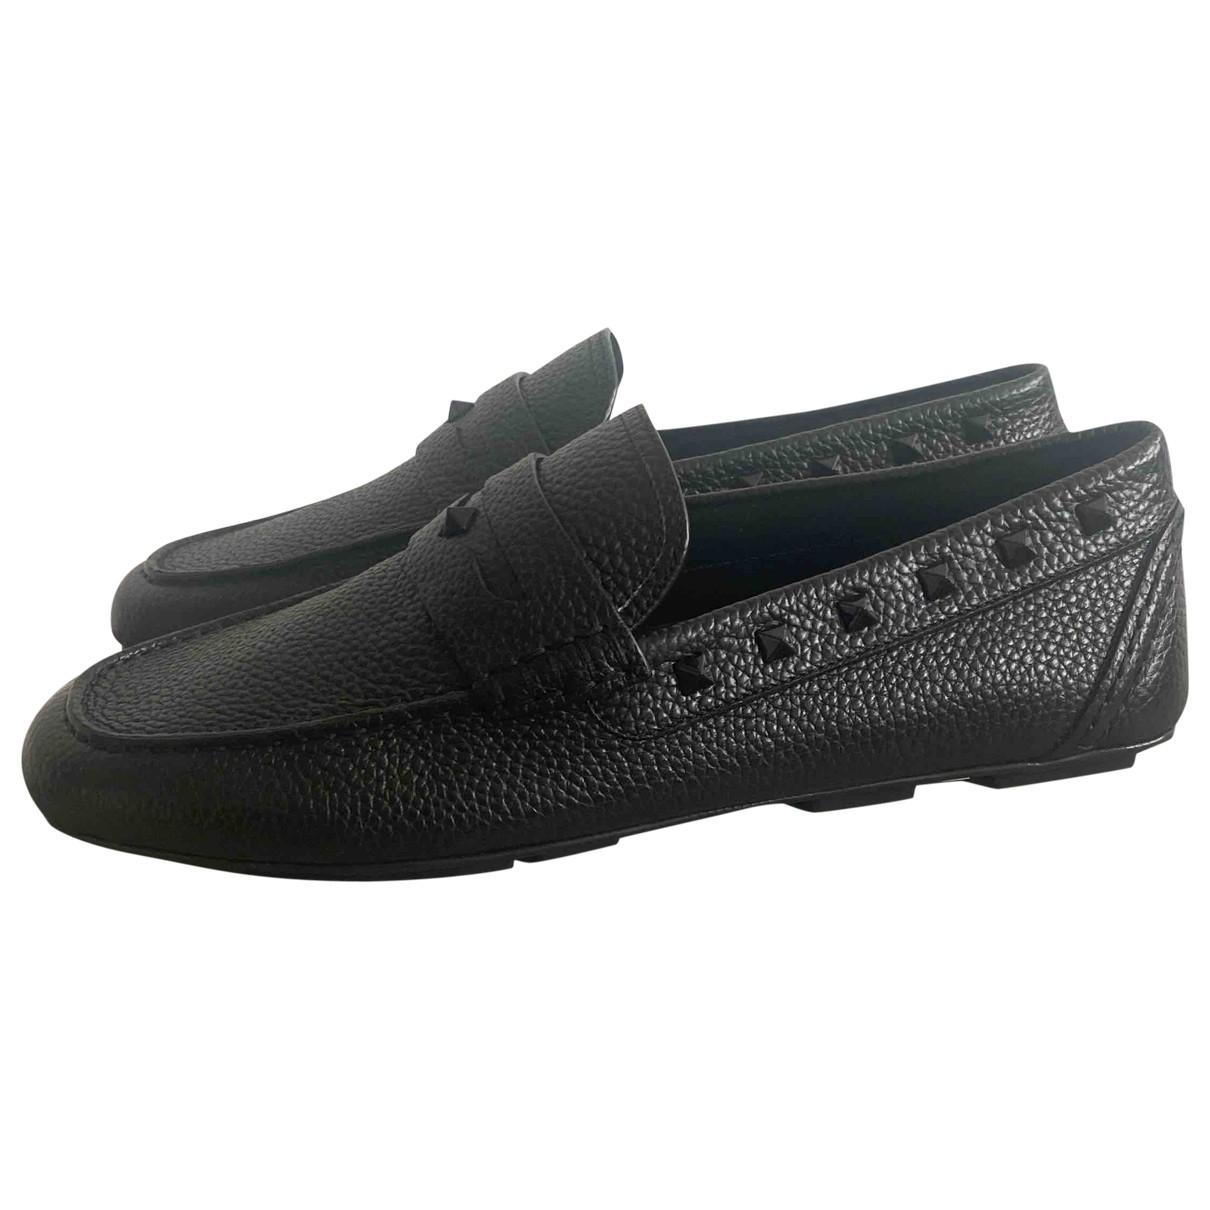 Valentino Garavani \N Black Leather Flats for Men 42.5 EU